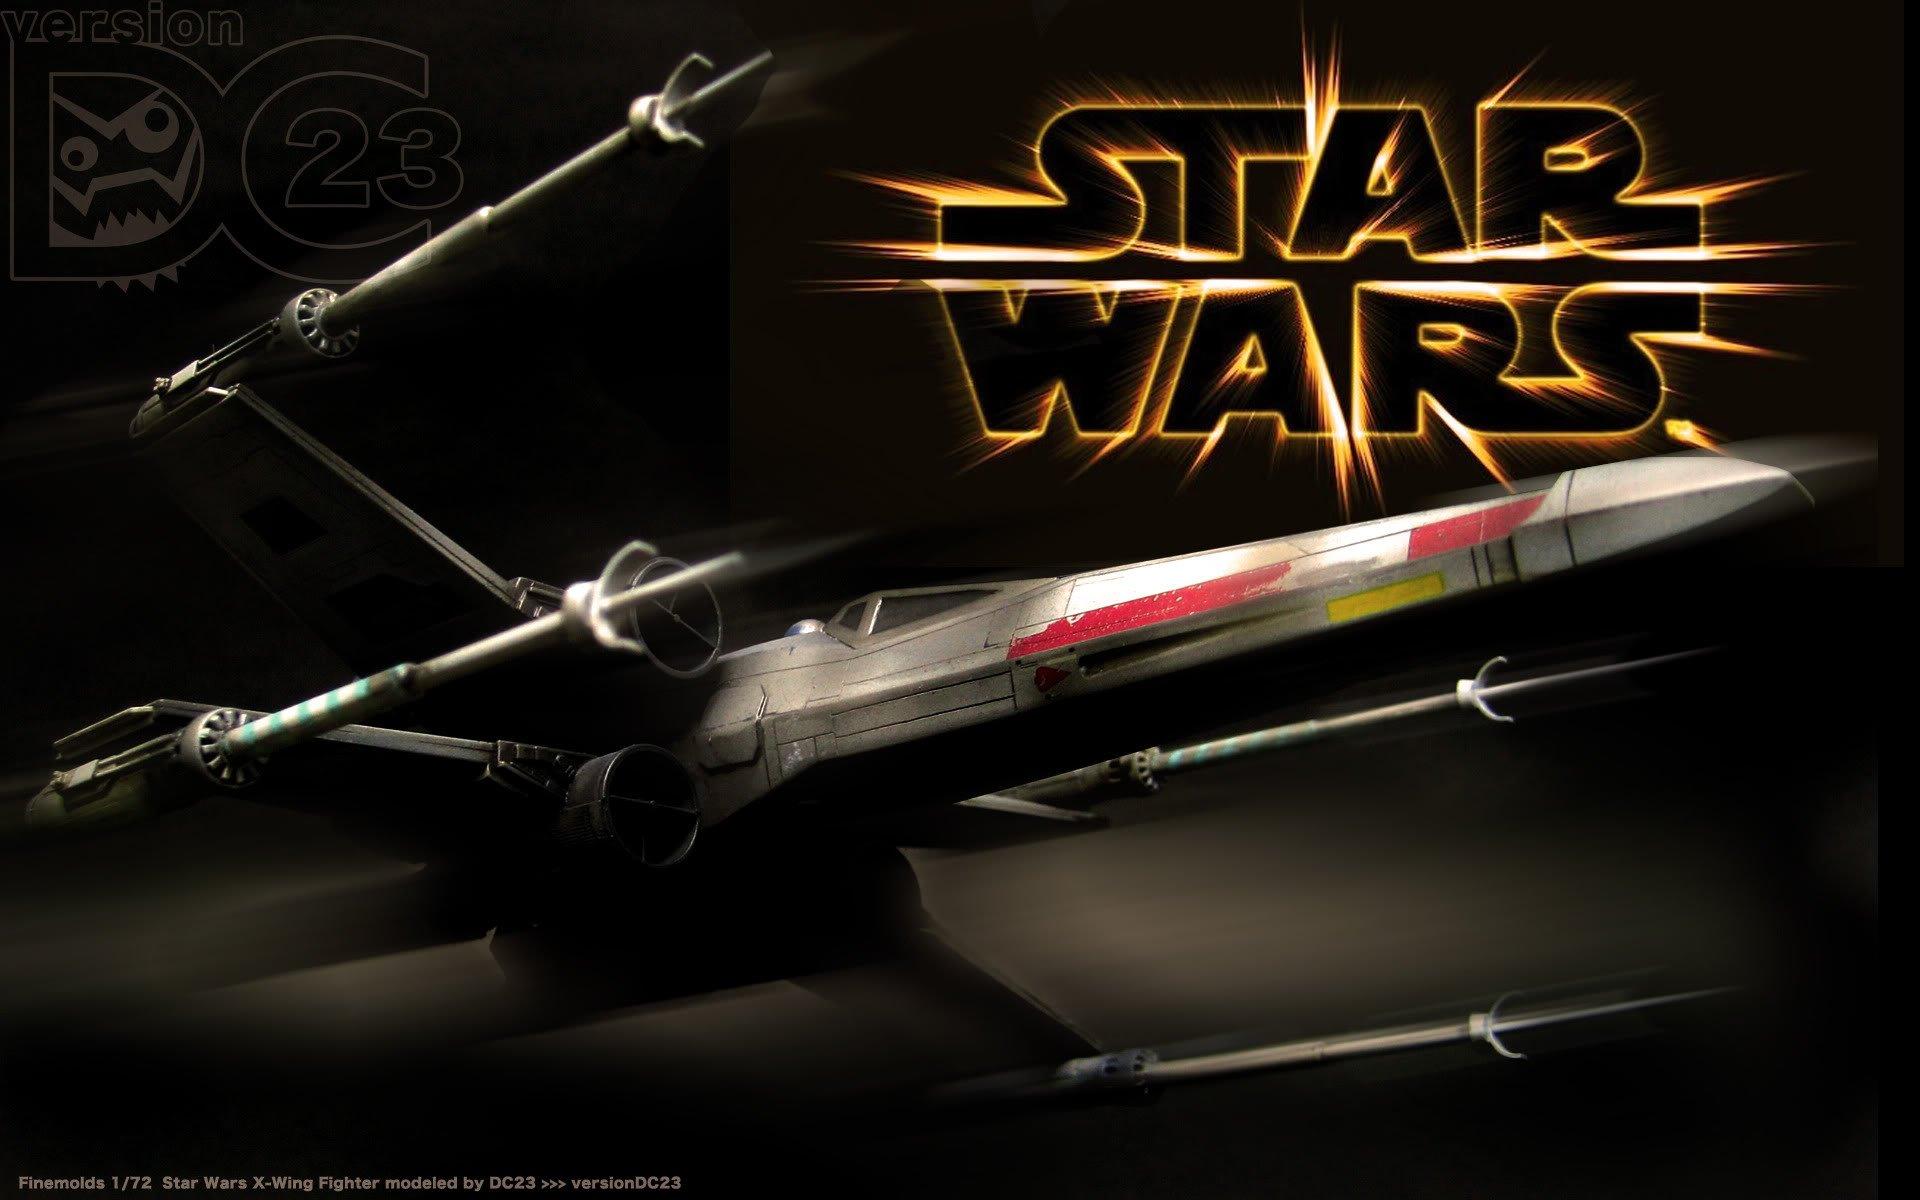 Star Wars X Wing Spaceship Futuristic Space Sci Fi Xwing Wallpaper 1920x1200 811229 Wallpaperup